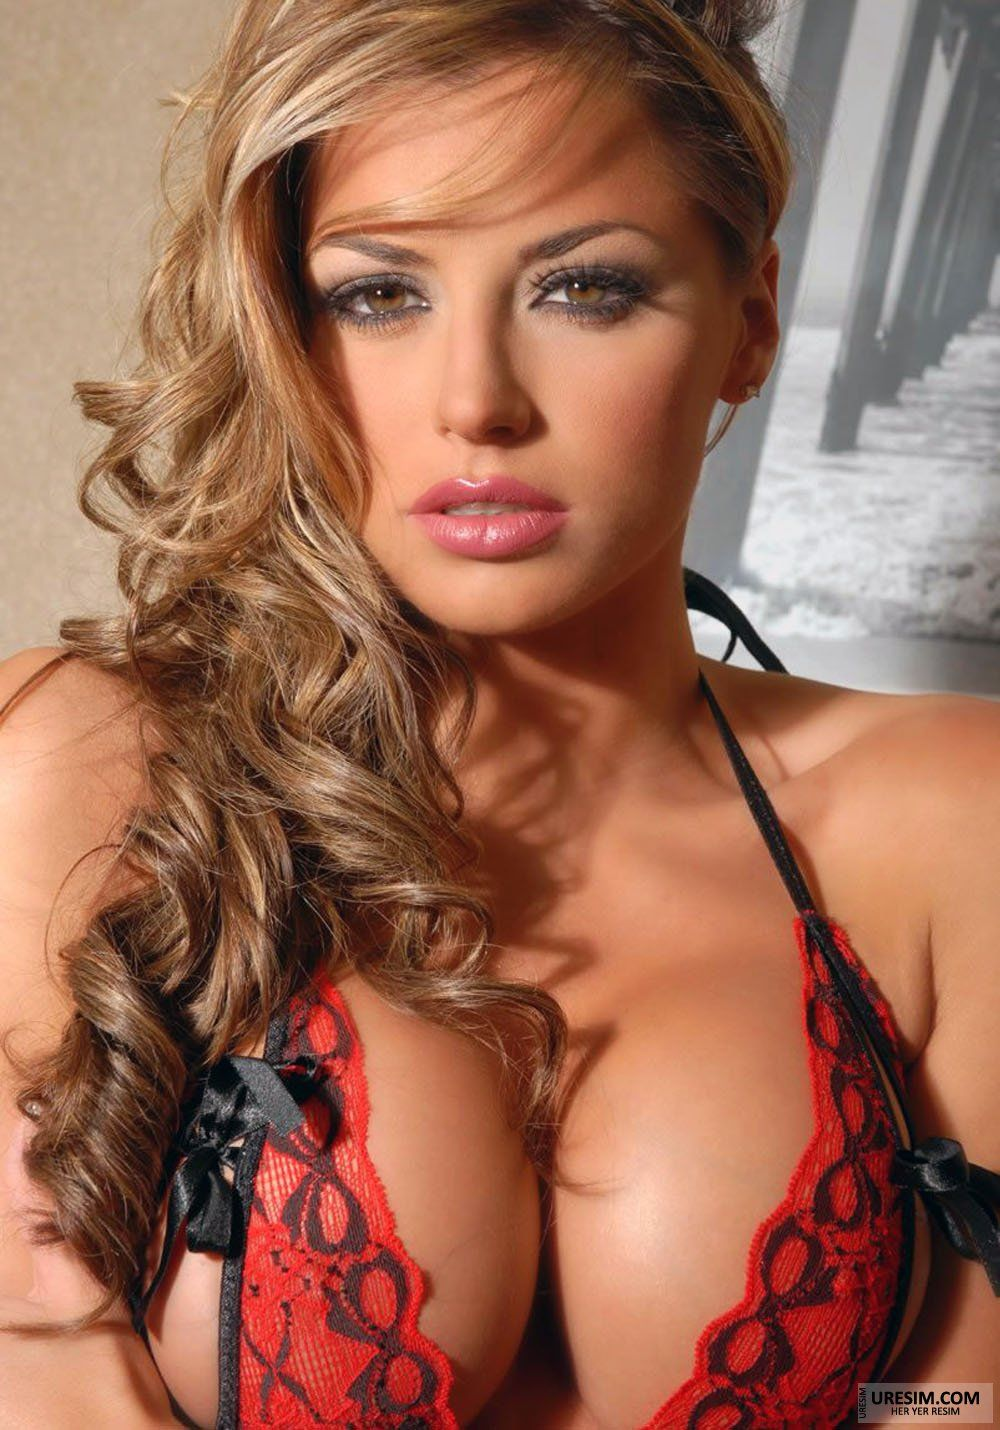 Lindsay Frost,Roslyn Gentle Erotic fotos Gemma Chan (born 1982),Bianca King (b. 1985)